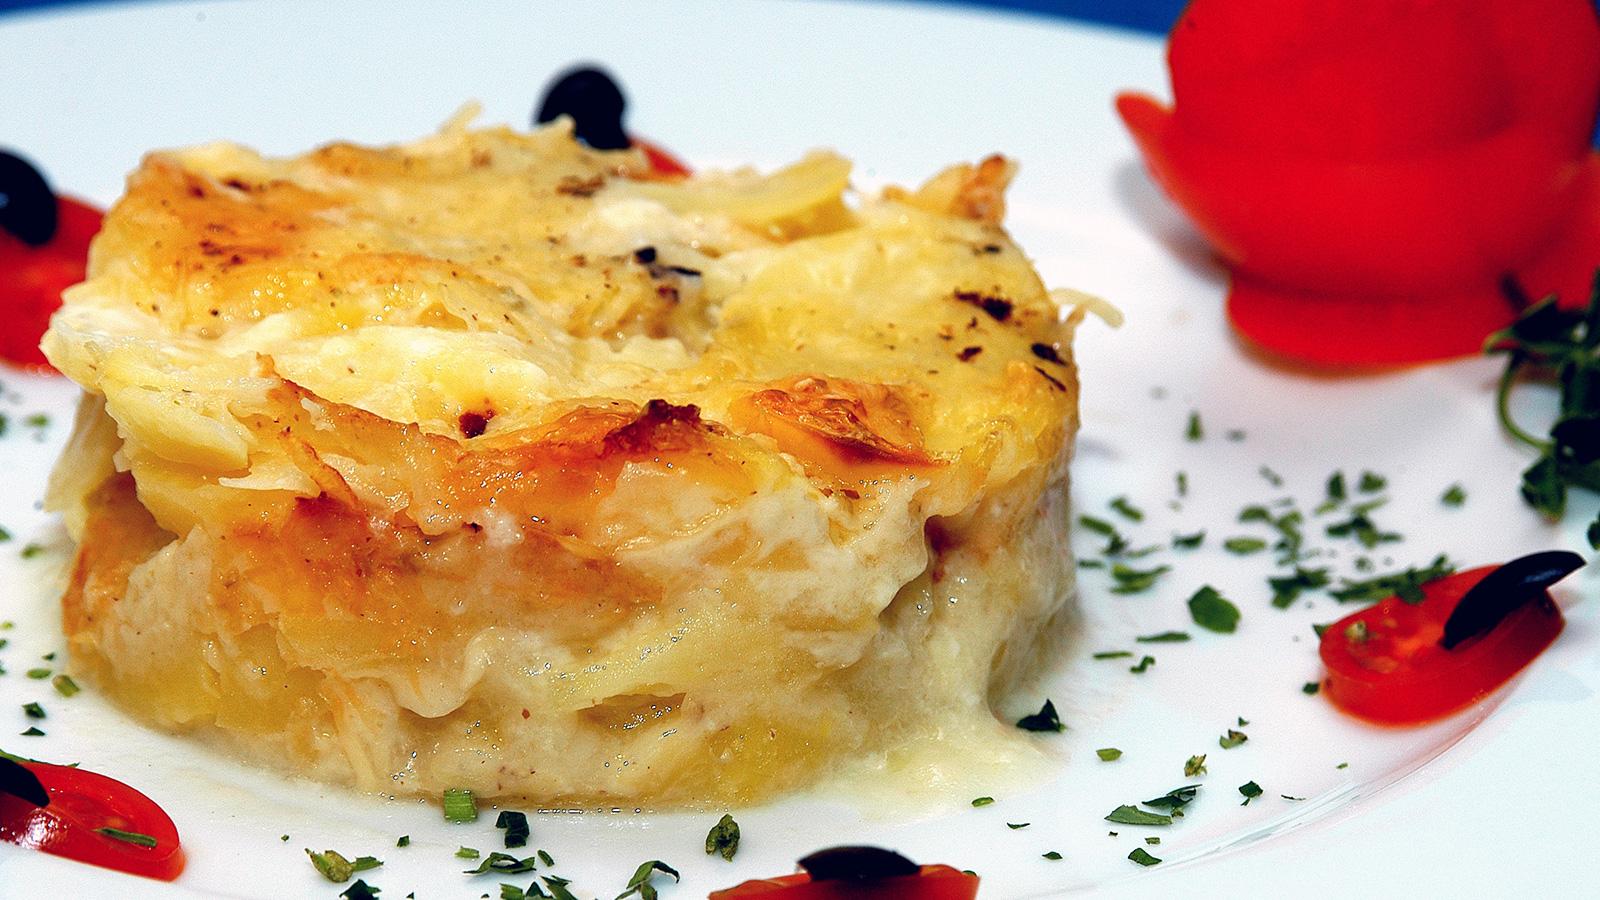 Gratinado de patata i aki oyarbide video receta - Gratinado de patata ...